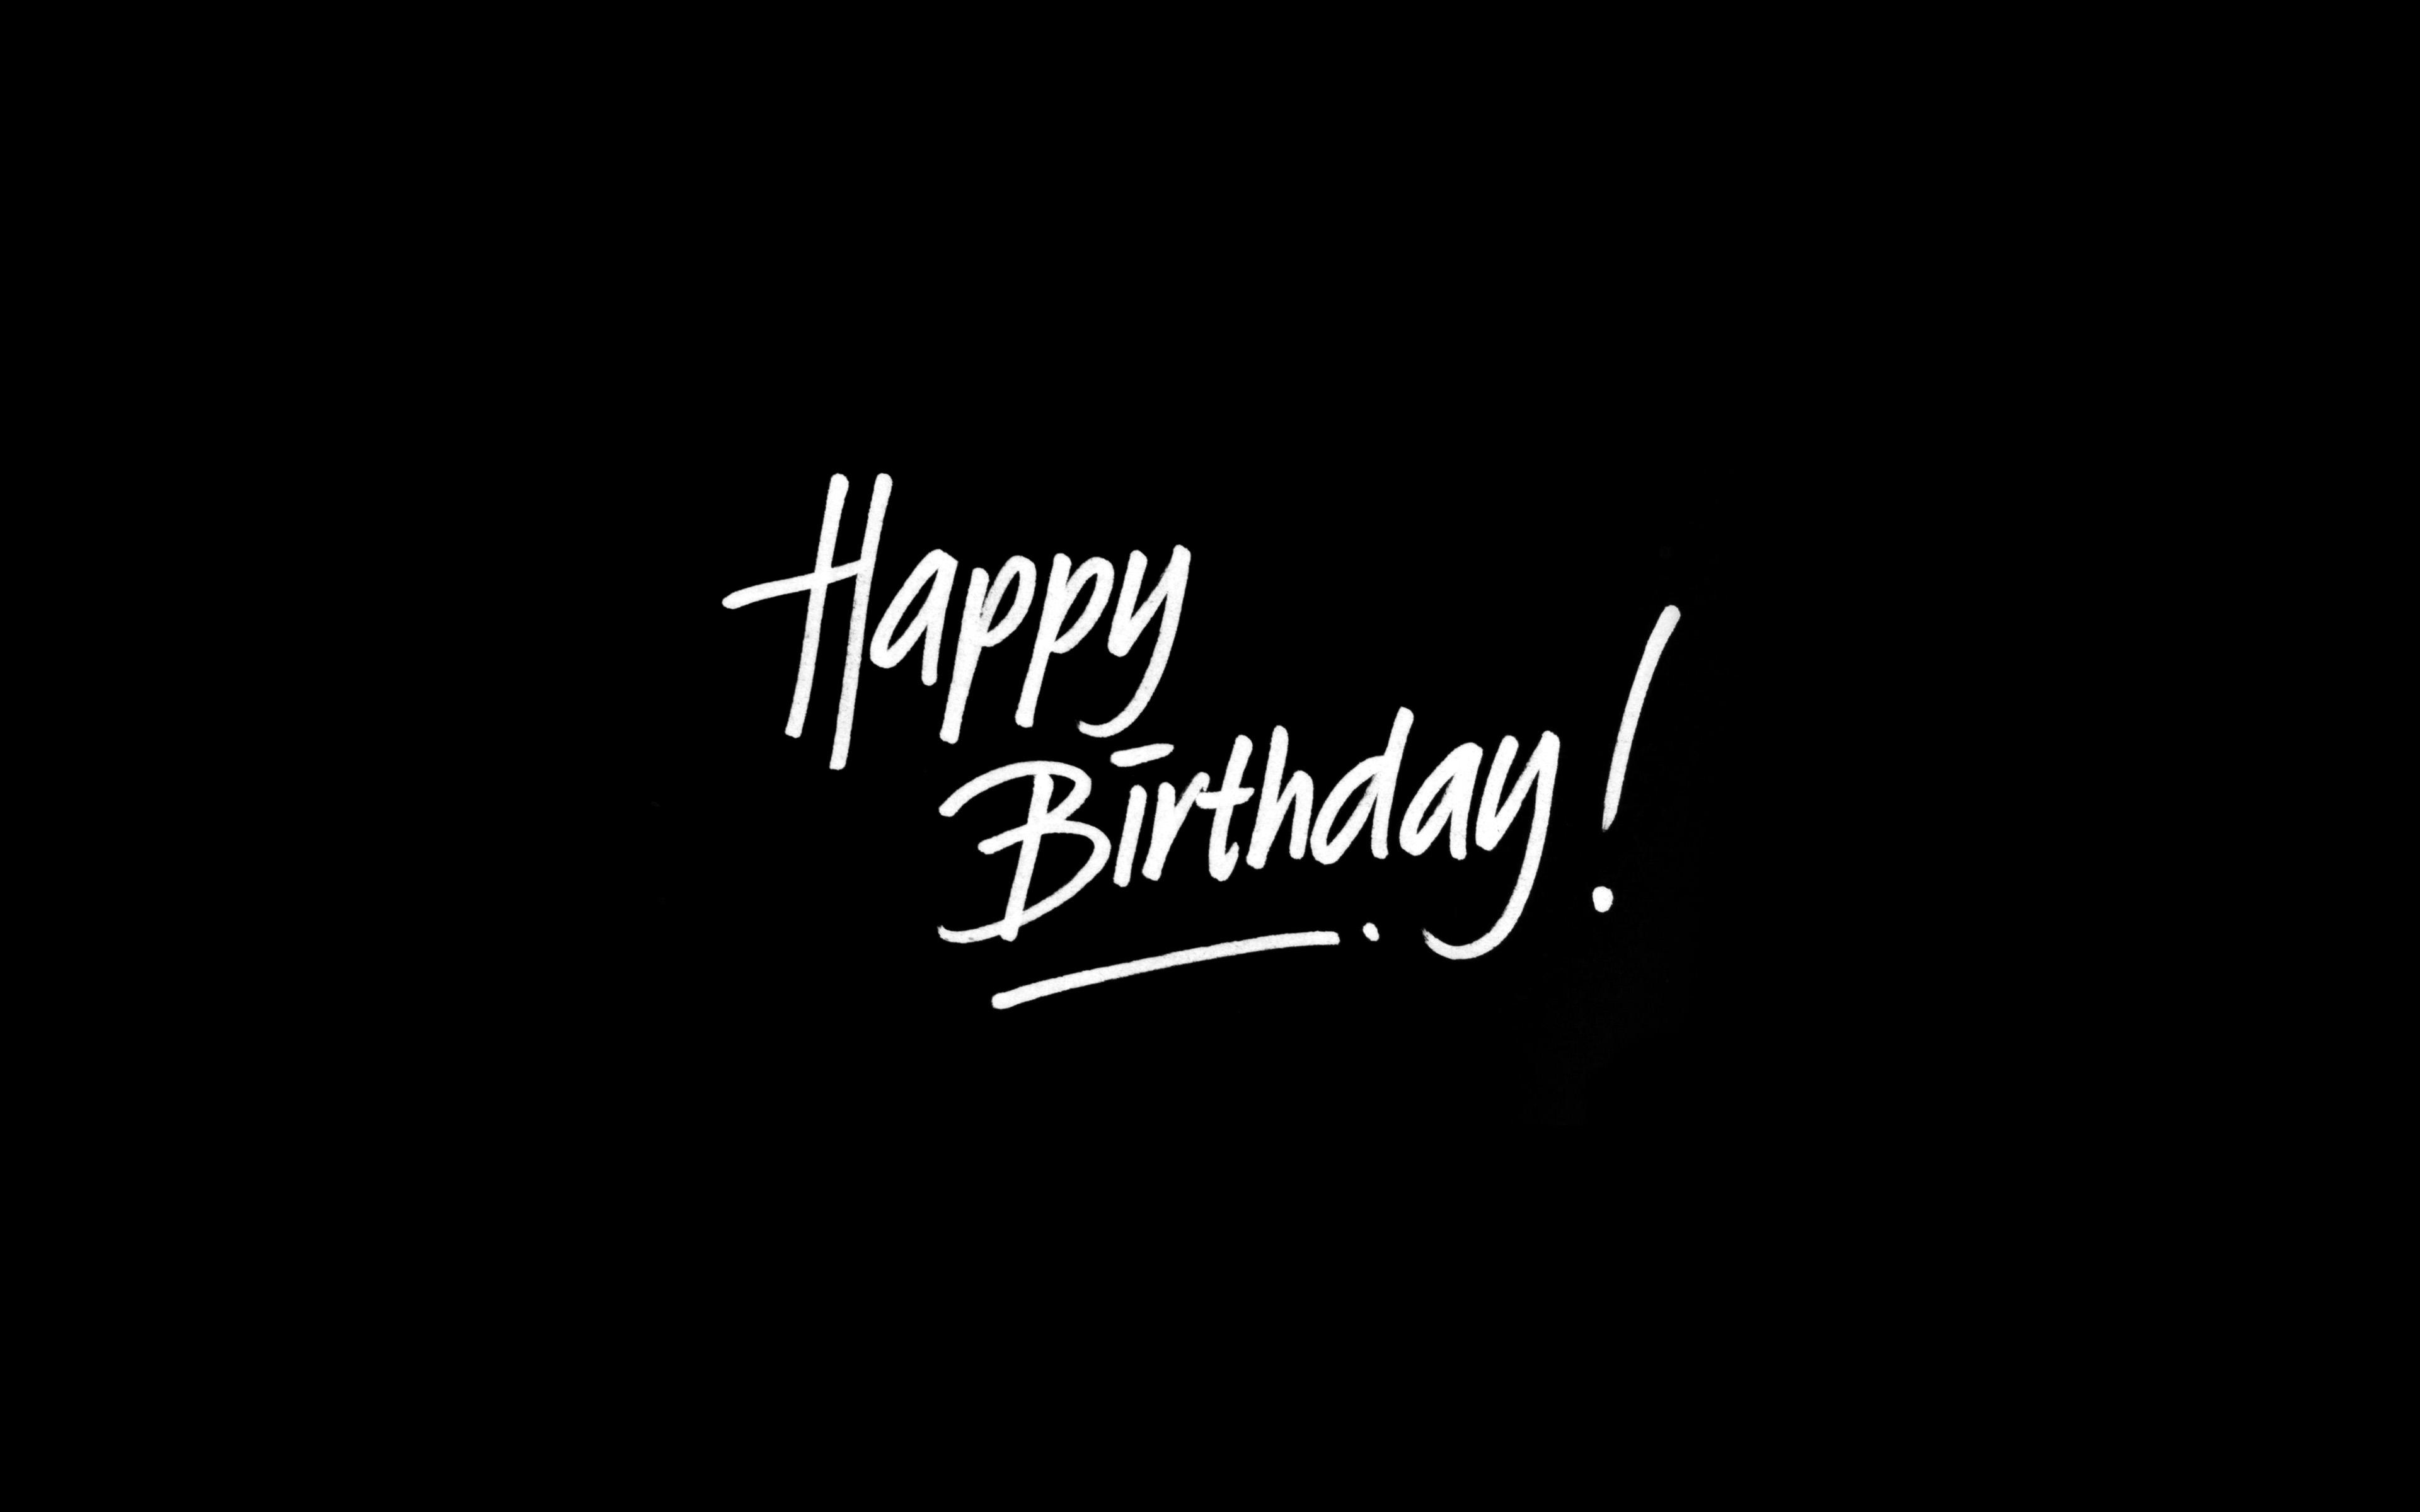 Ap54 Happy Birthday Dark Event Writing Wallpaper